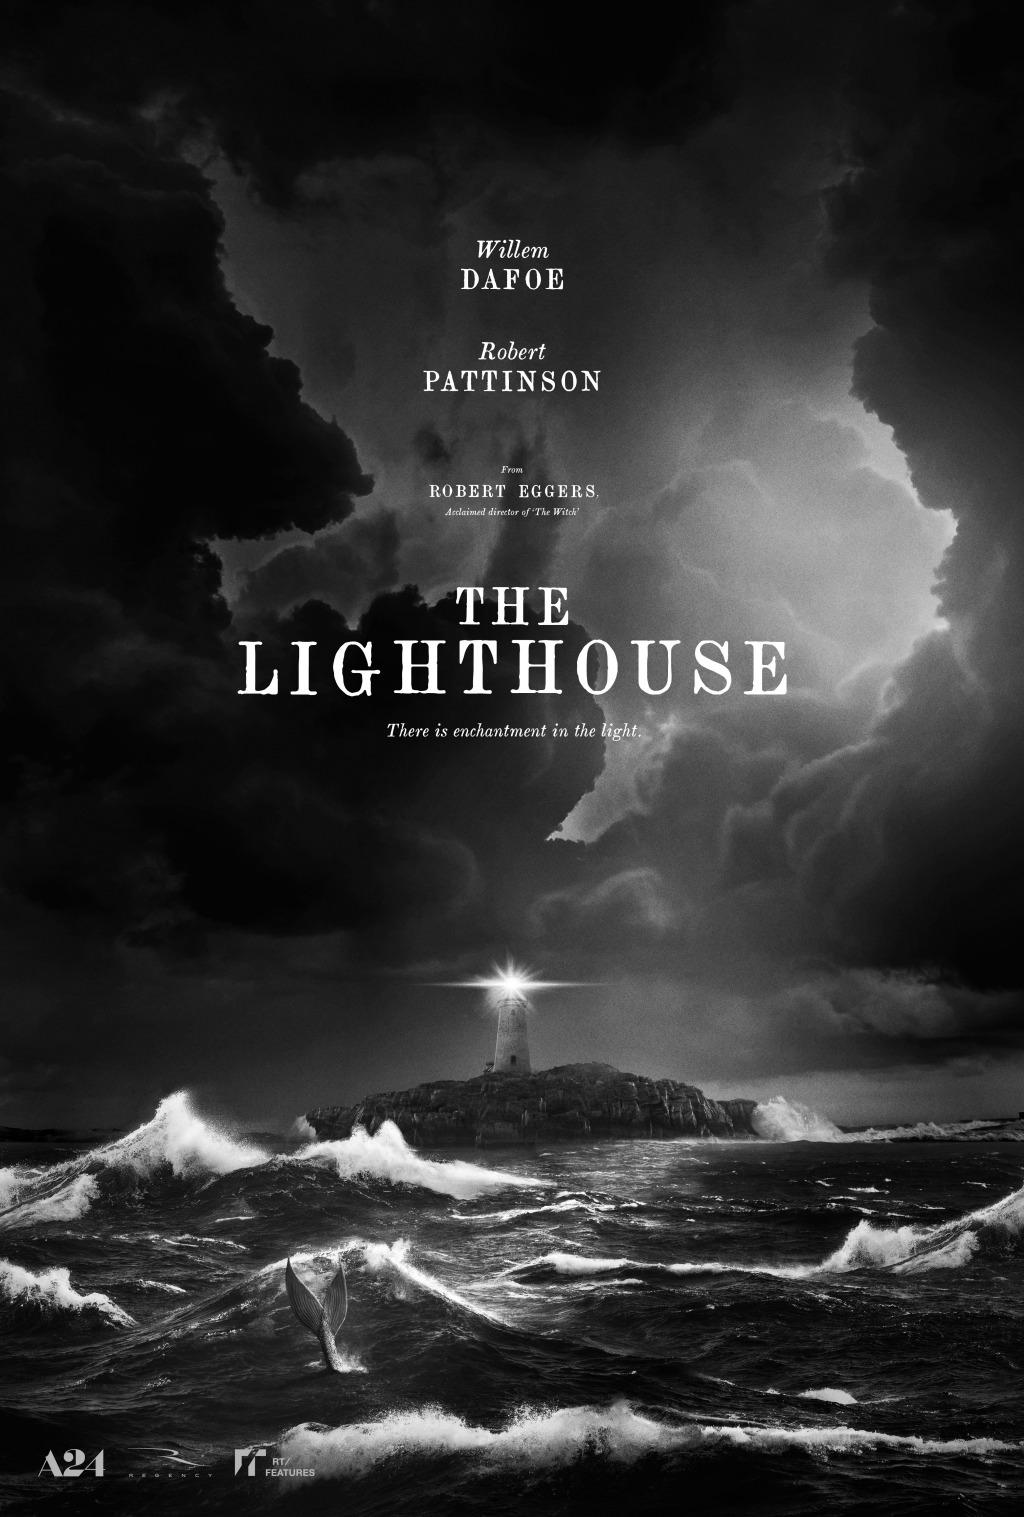 The Lighthouse (2019) | Robert Eggers | Robert Pattinson